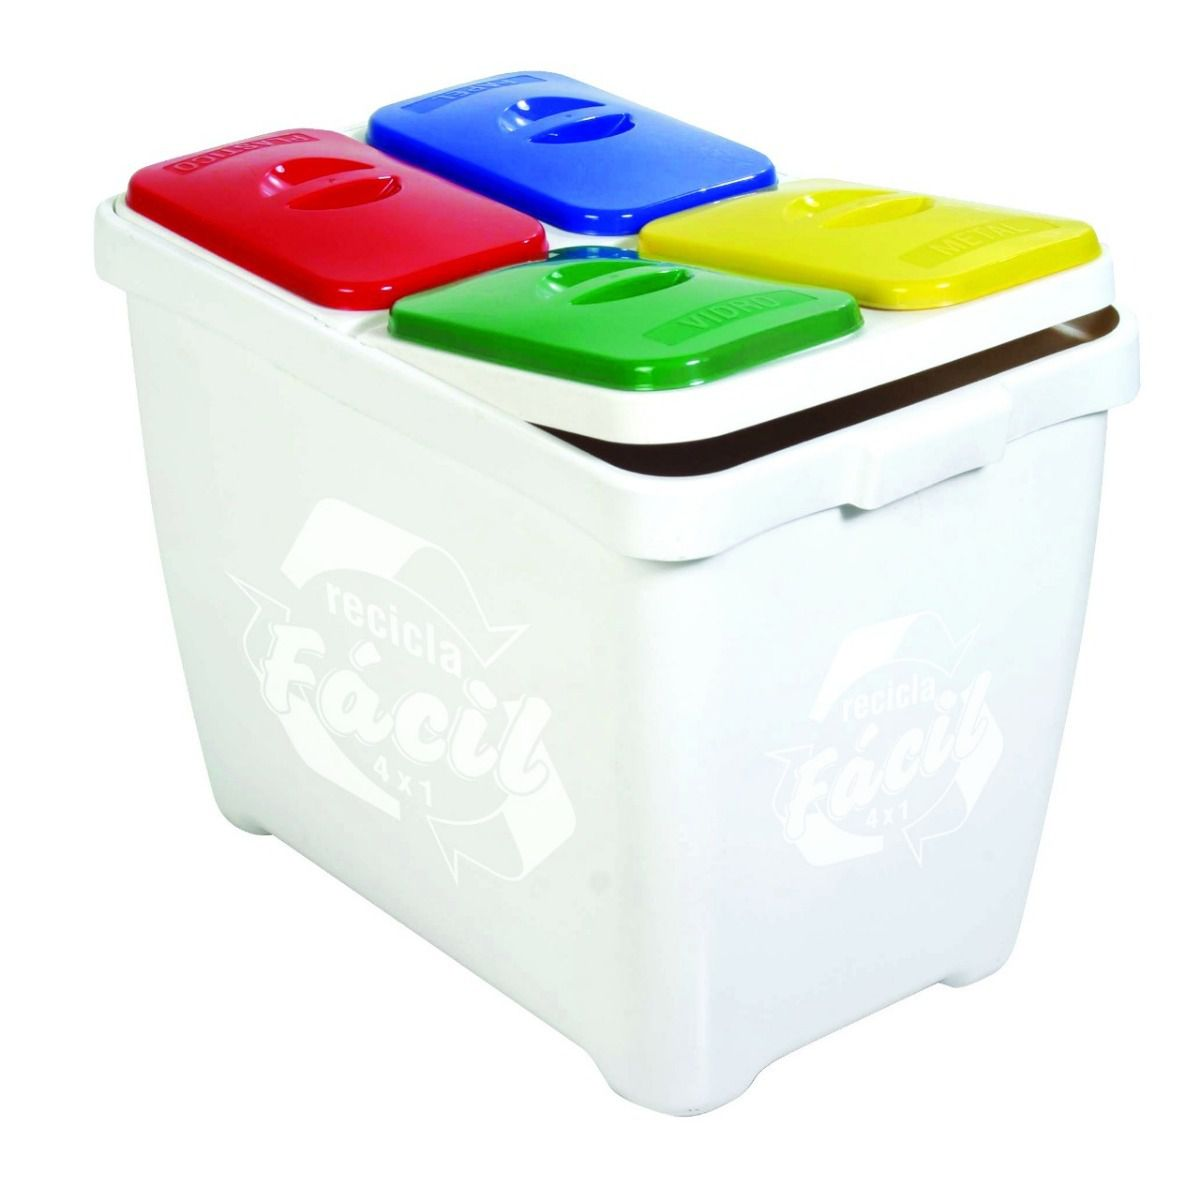 Lixeira para Coleta Seletiva 80 Litros Recicla Fácil